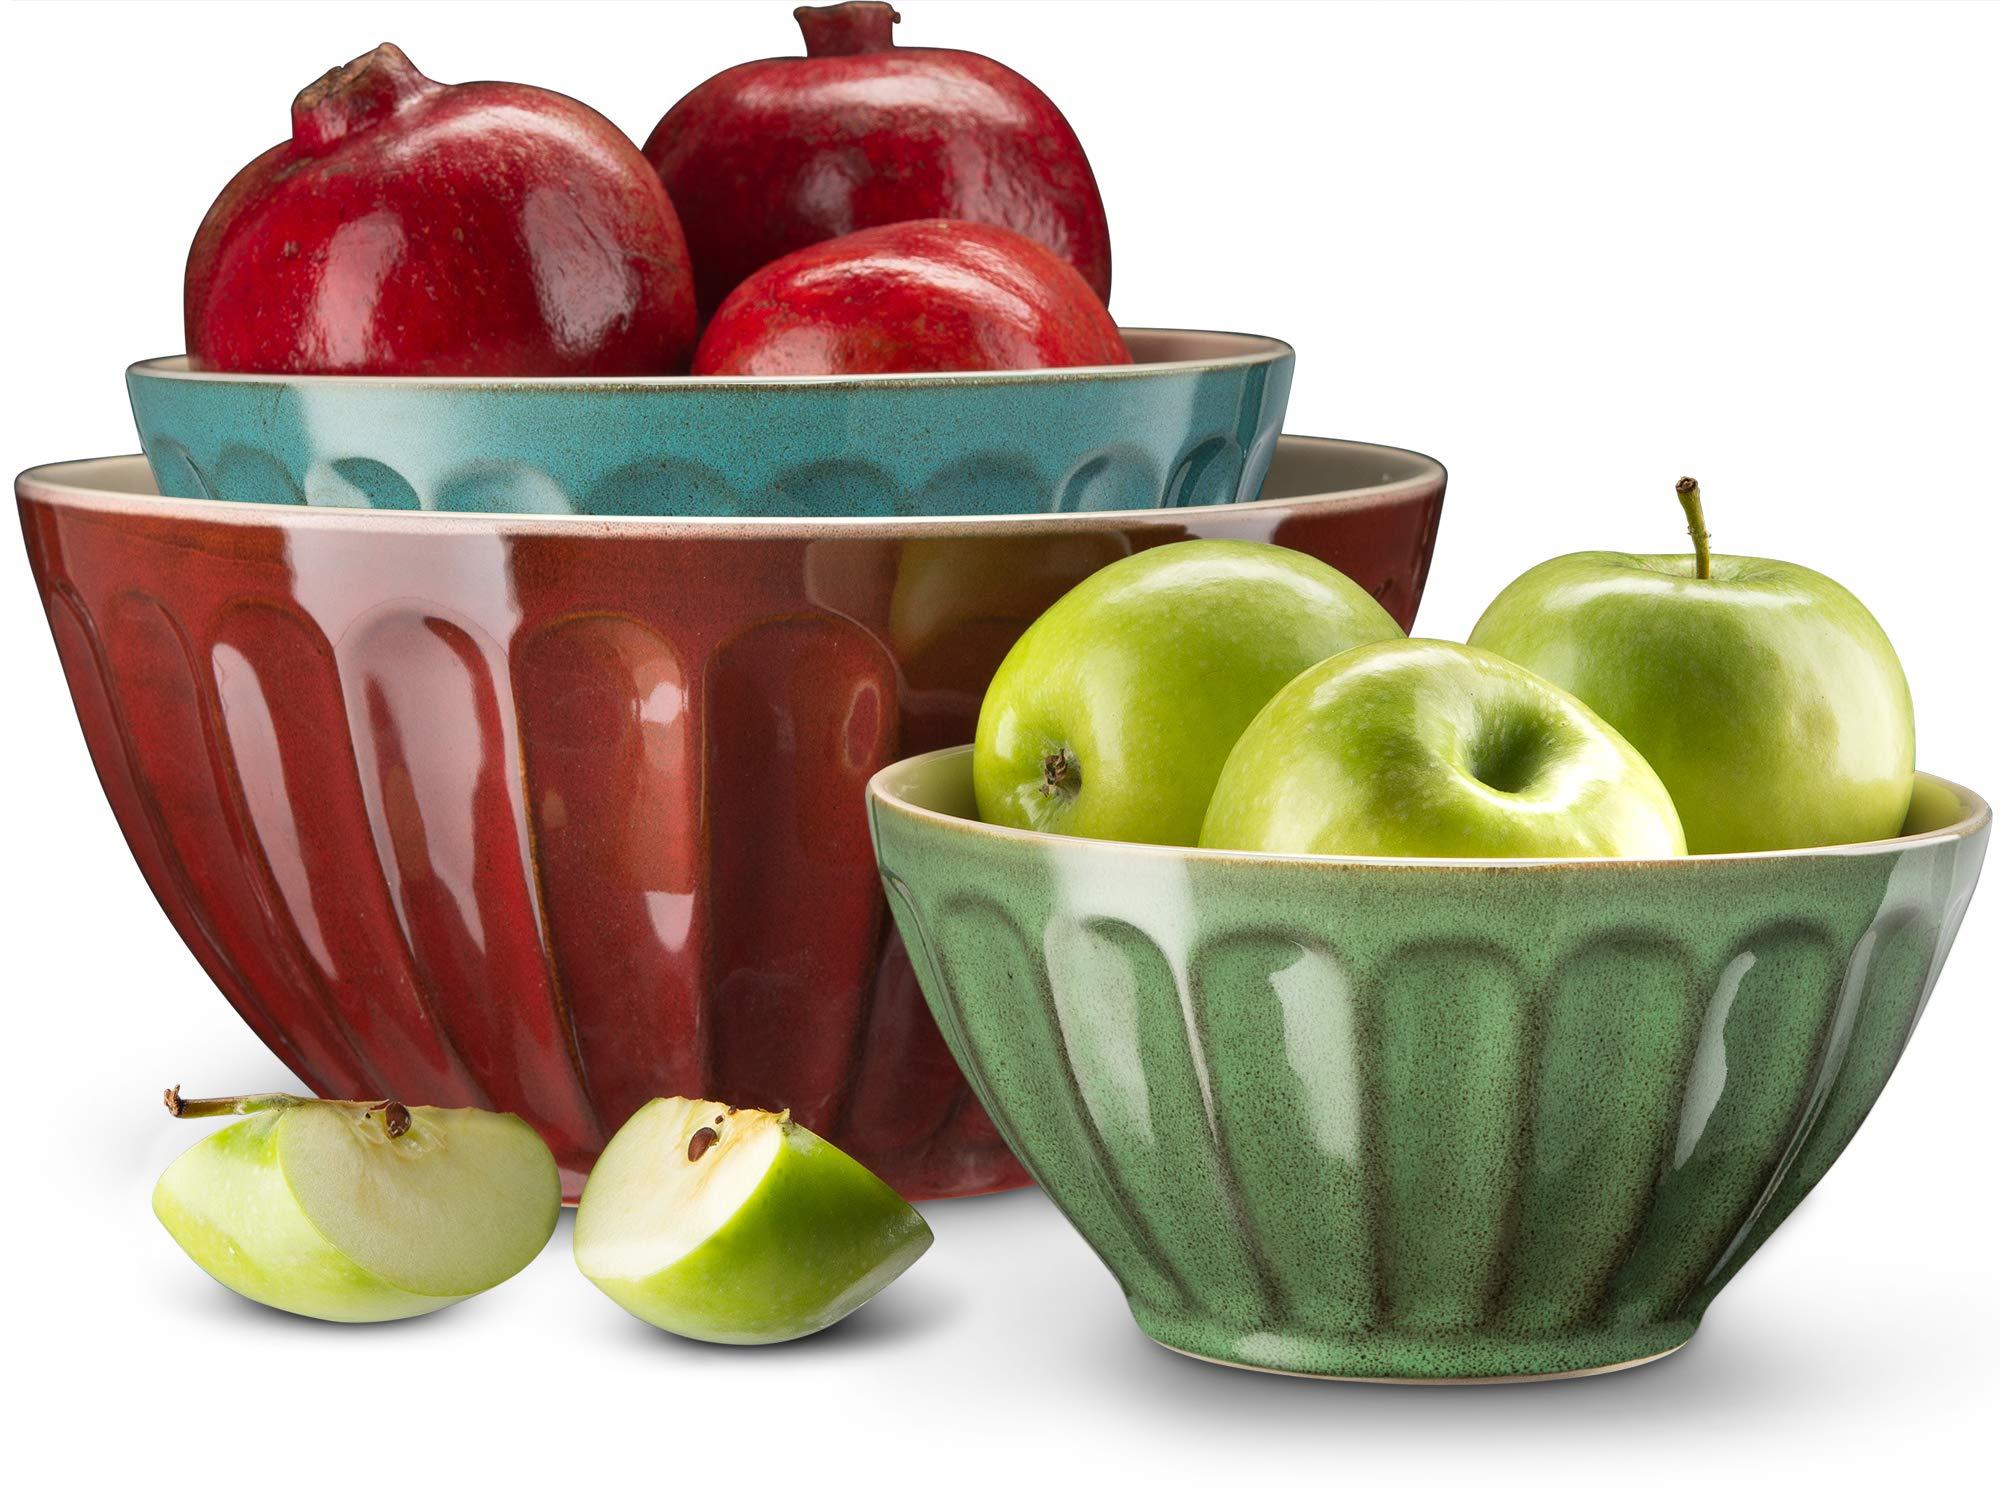 KooK Color Ceramic Mixing/Serving Bowls, Large, Medium, Small, Nesting, Set of 3 by KooK